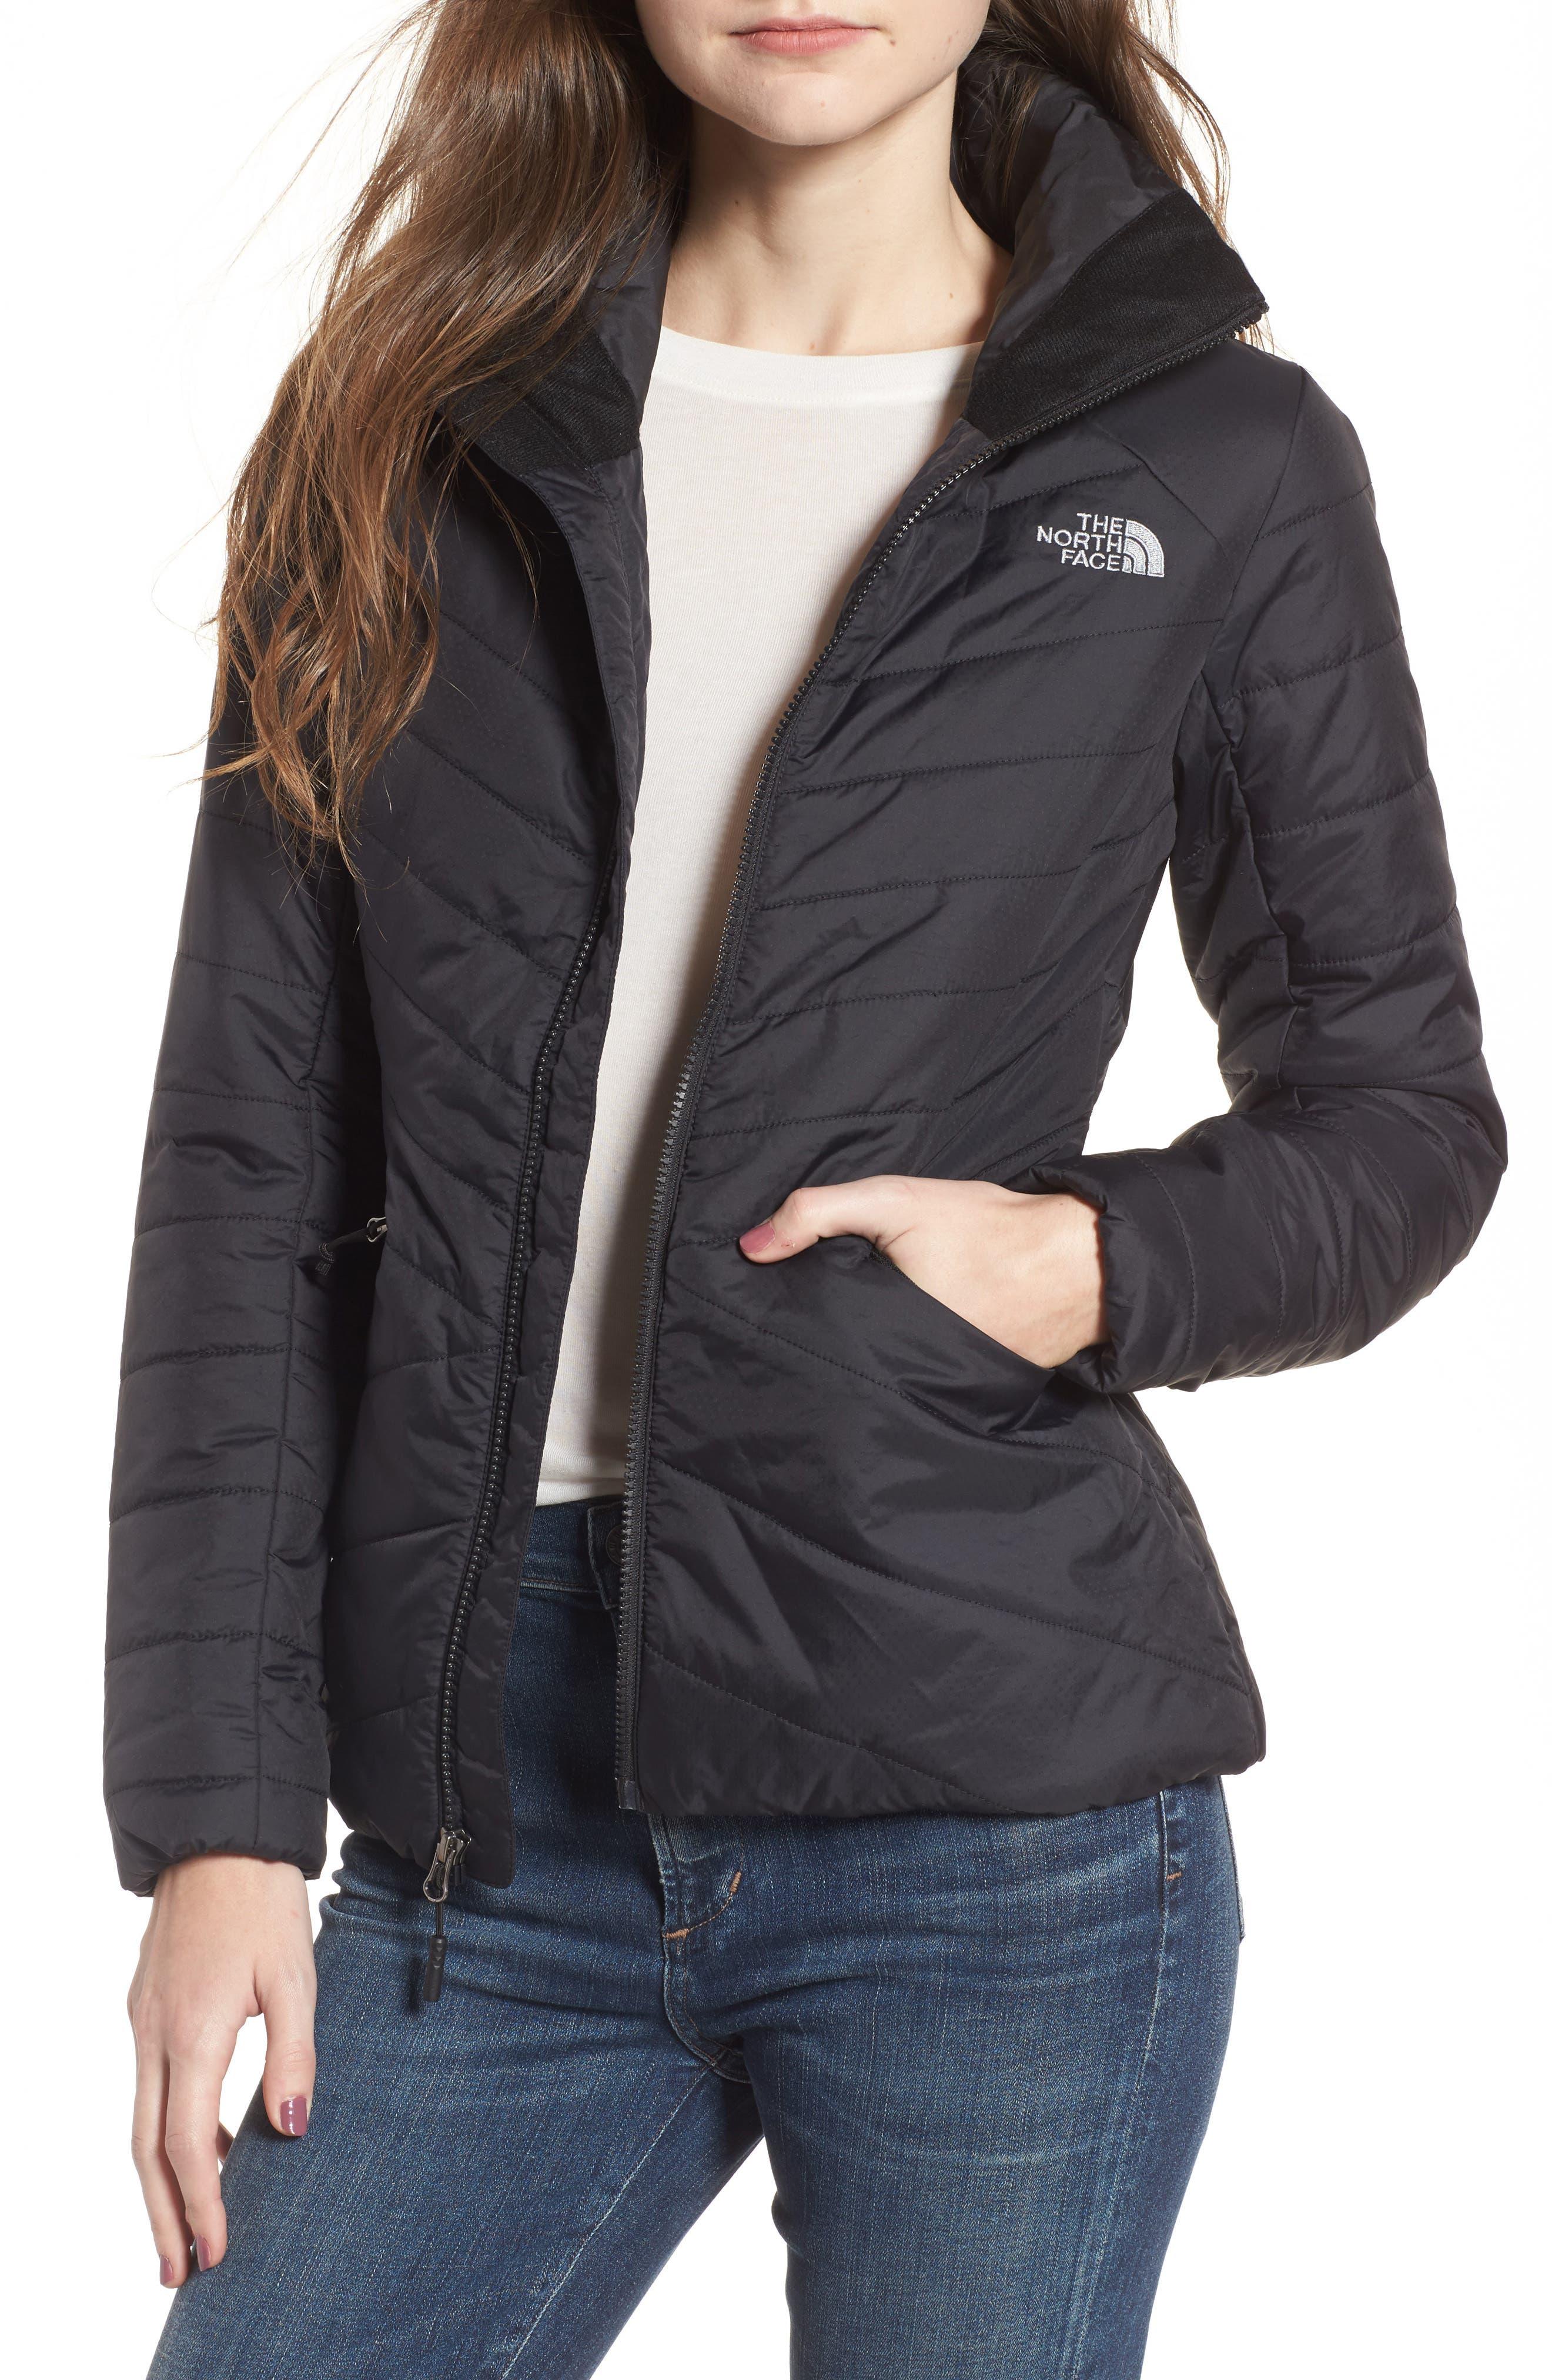 Moonlight Heatseeker Insulated Jacket,                         Main,                         color, 001